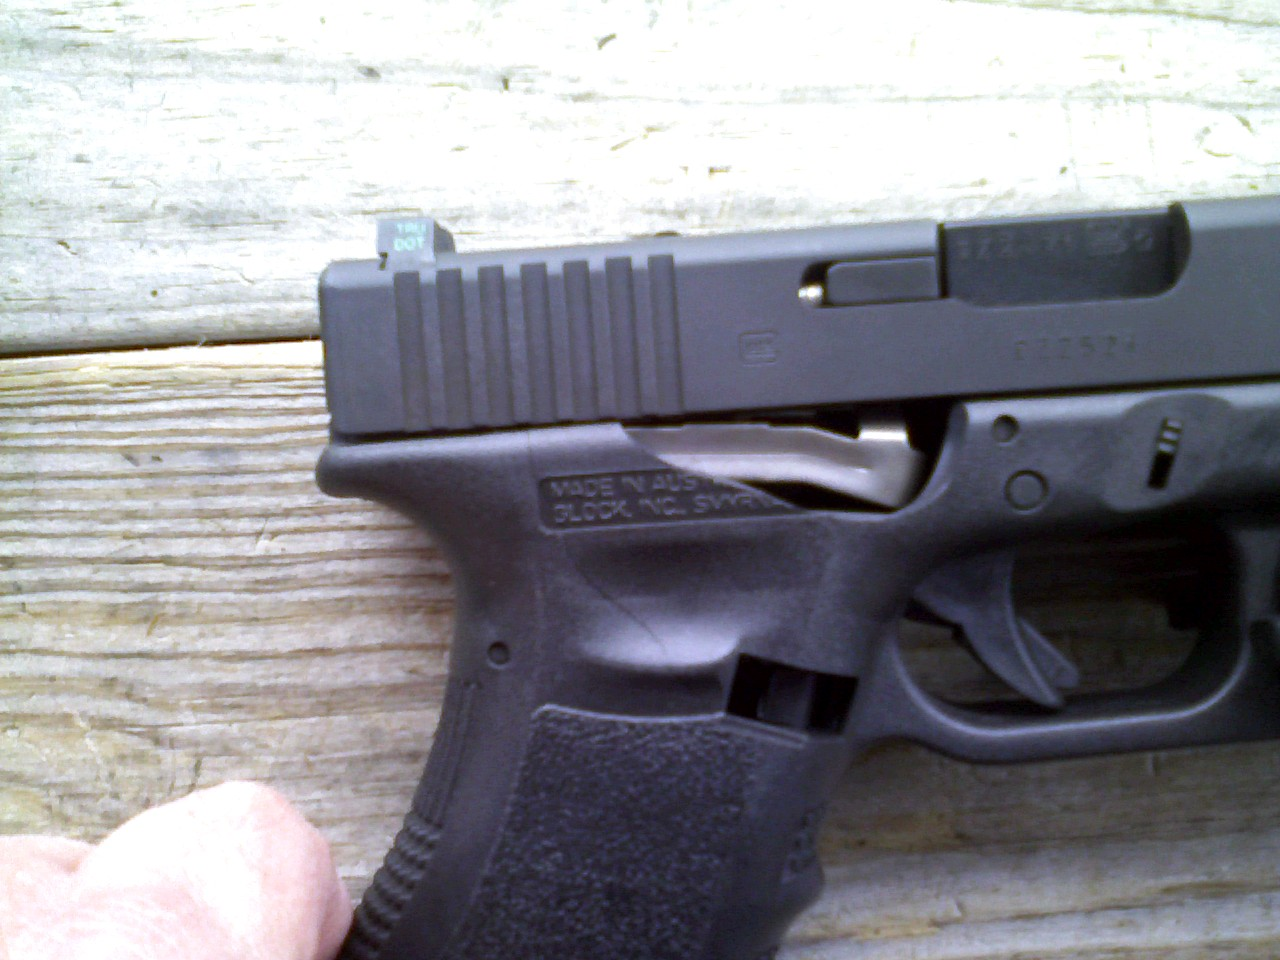 Glock 22 Kb at the range today-pic-0016.jpg